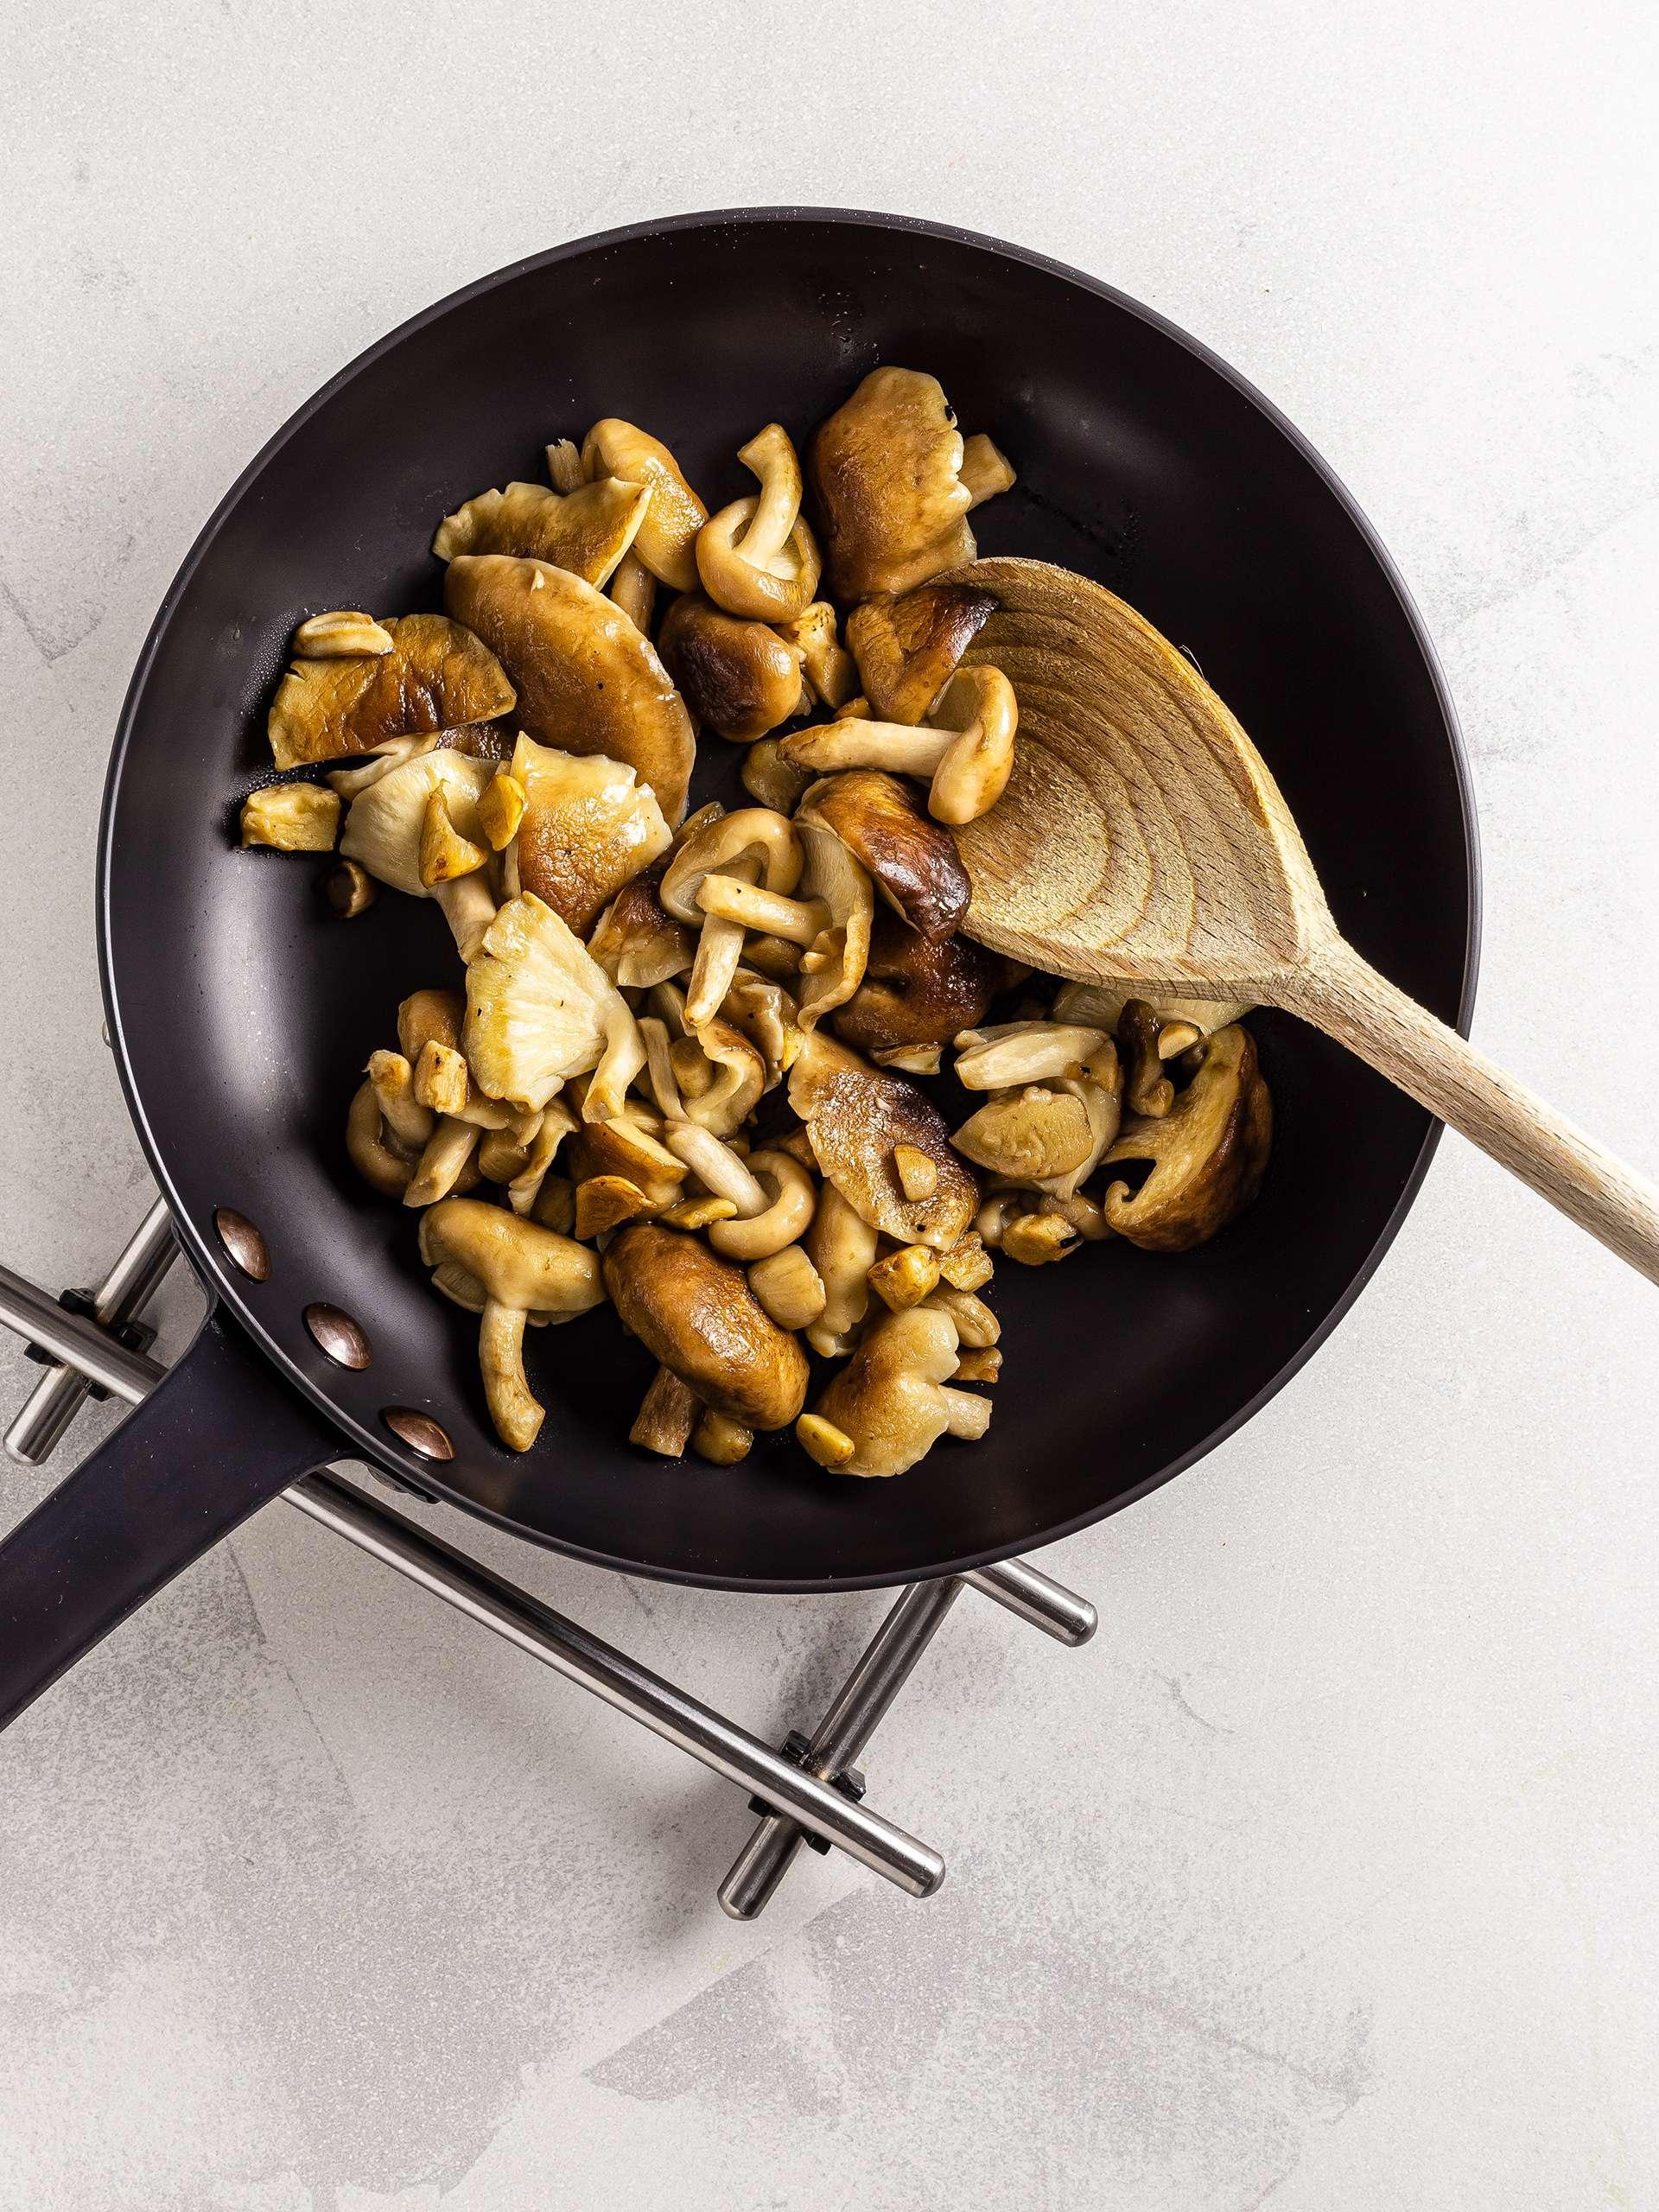 Sautéed shiitake mushrooms in a skillet